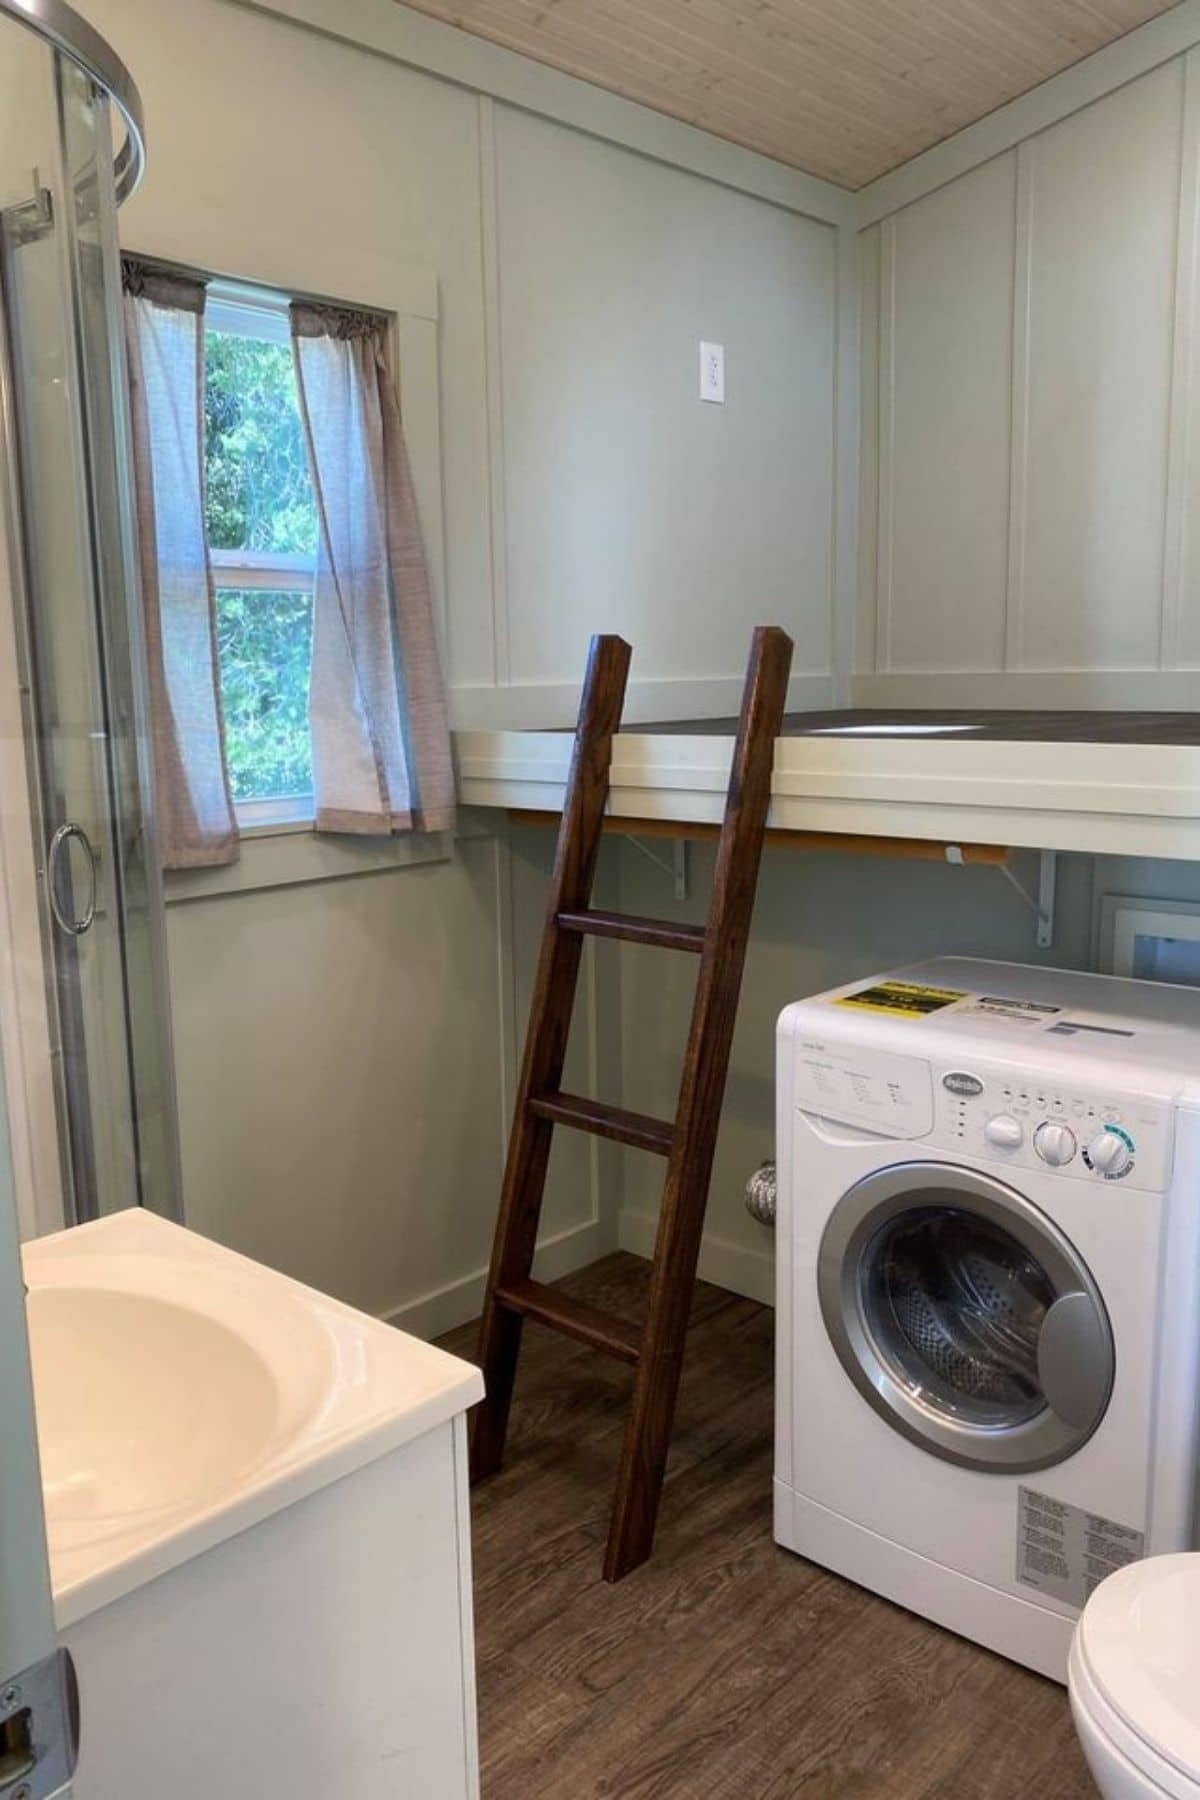 Loft space above washing machine with wood ladder